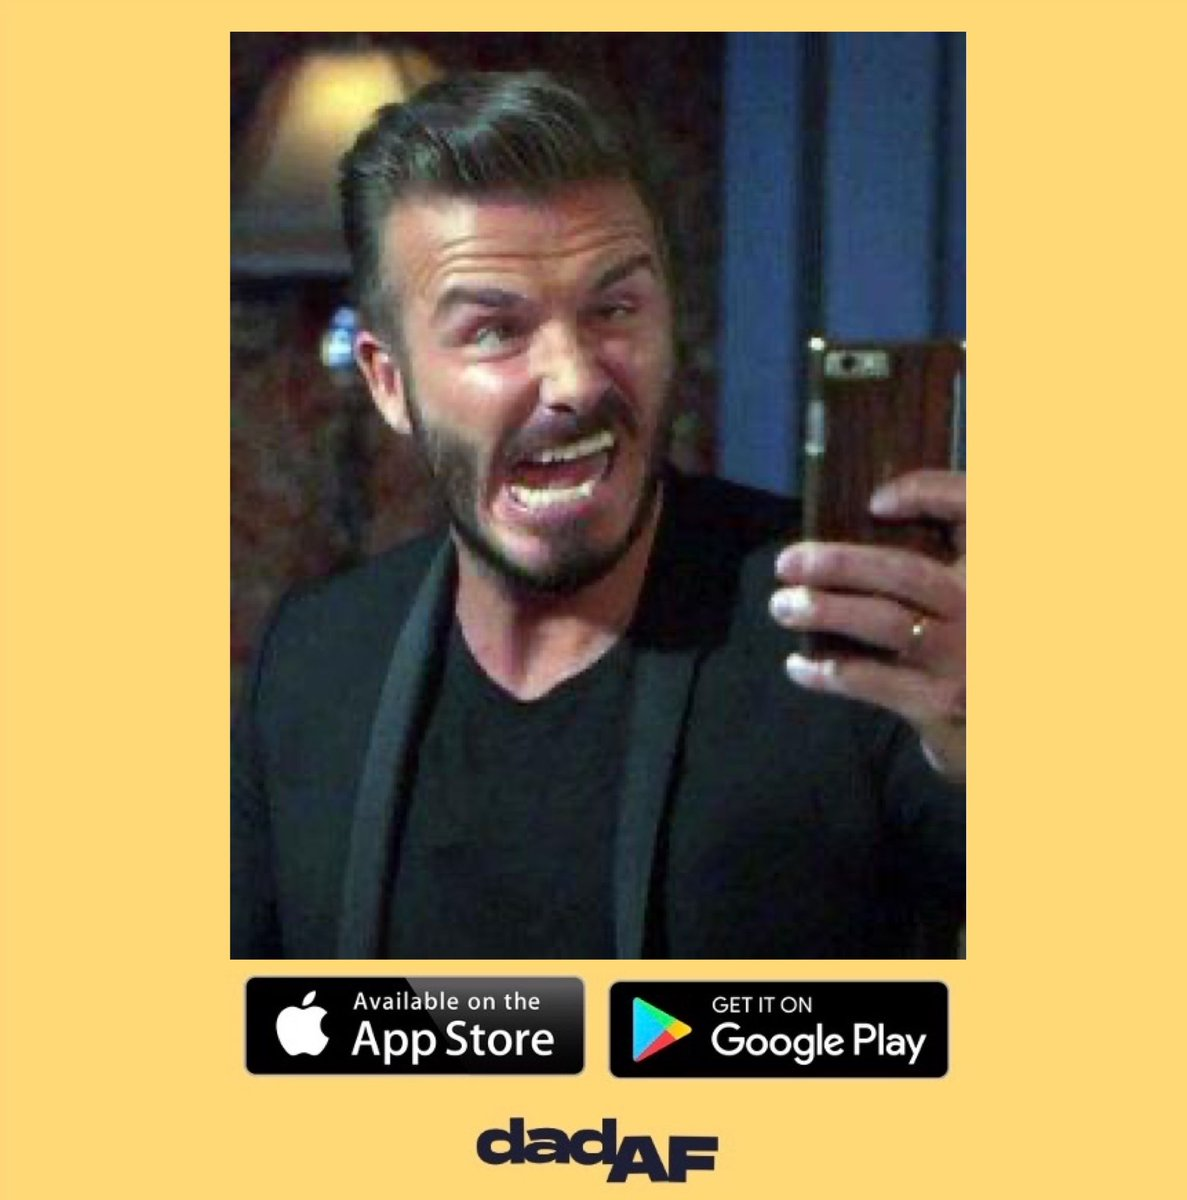 David Beckham taking his profile picture for the Dad AF app... he's a funny guy • • • #dad #dadaf #dadlife #dads #davidbeckham #beckham #england #football #manager #footballplayer #footballcoach #dadcommunity #dadnetwork #footballcommunity #footballdad #footballkids #parentingpic.twitter.com/HfUGx7v2i8